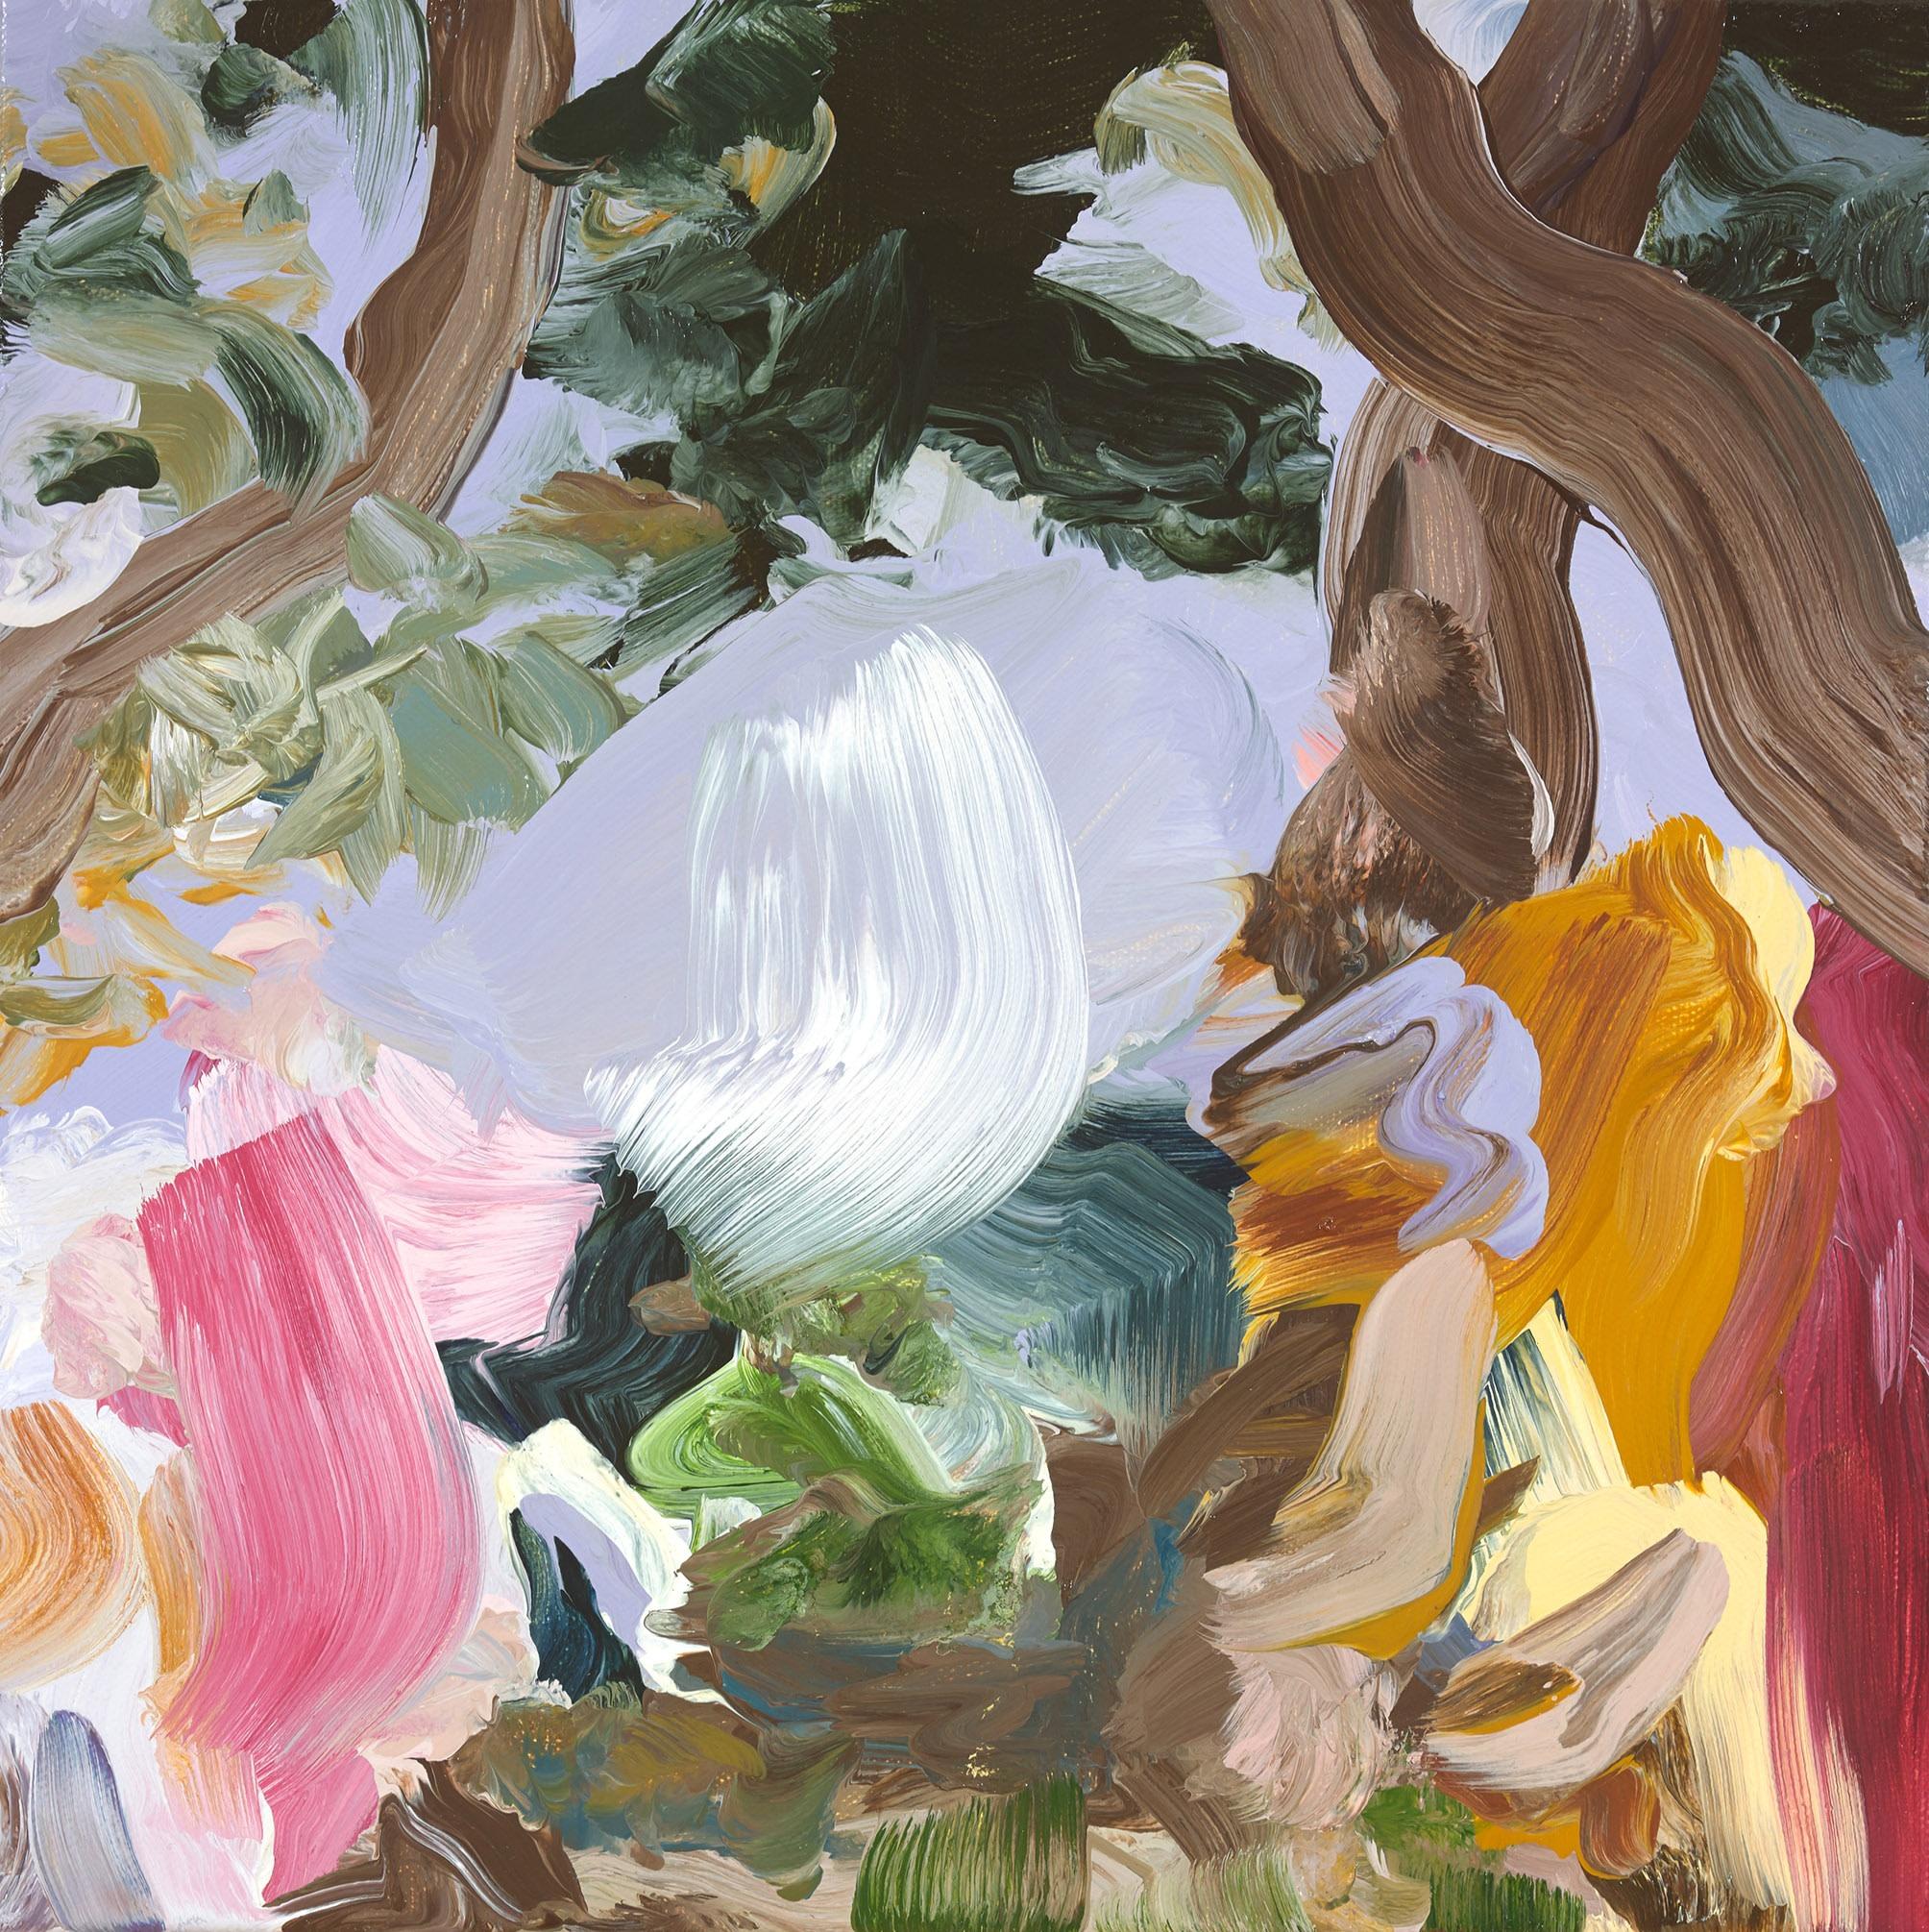 "<span class=""link fancybox-details-link""><a href=""/exhibitions/40/works/artworks109/"">View Detail Page</a></span><div class=""artist""><strong>Elise Ansel</strong></div><div class=""title""><em>Infidelity V</em>, 2015</div><div class=""medium"">Oil on Canvas</div><div class=""dimensions"">30.5 x 30.5 cm<br>12 x 12 in.</div>"